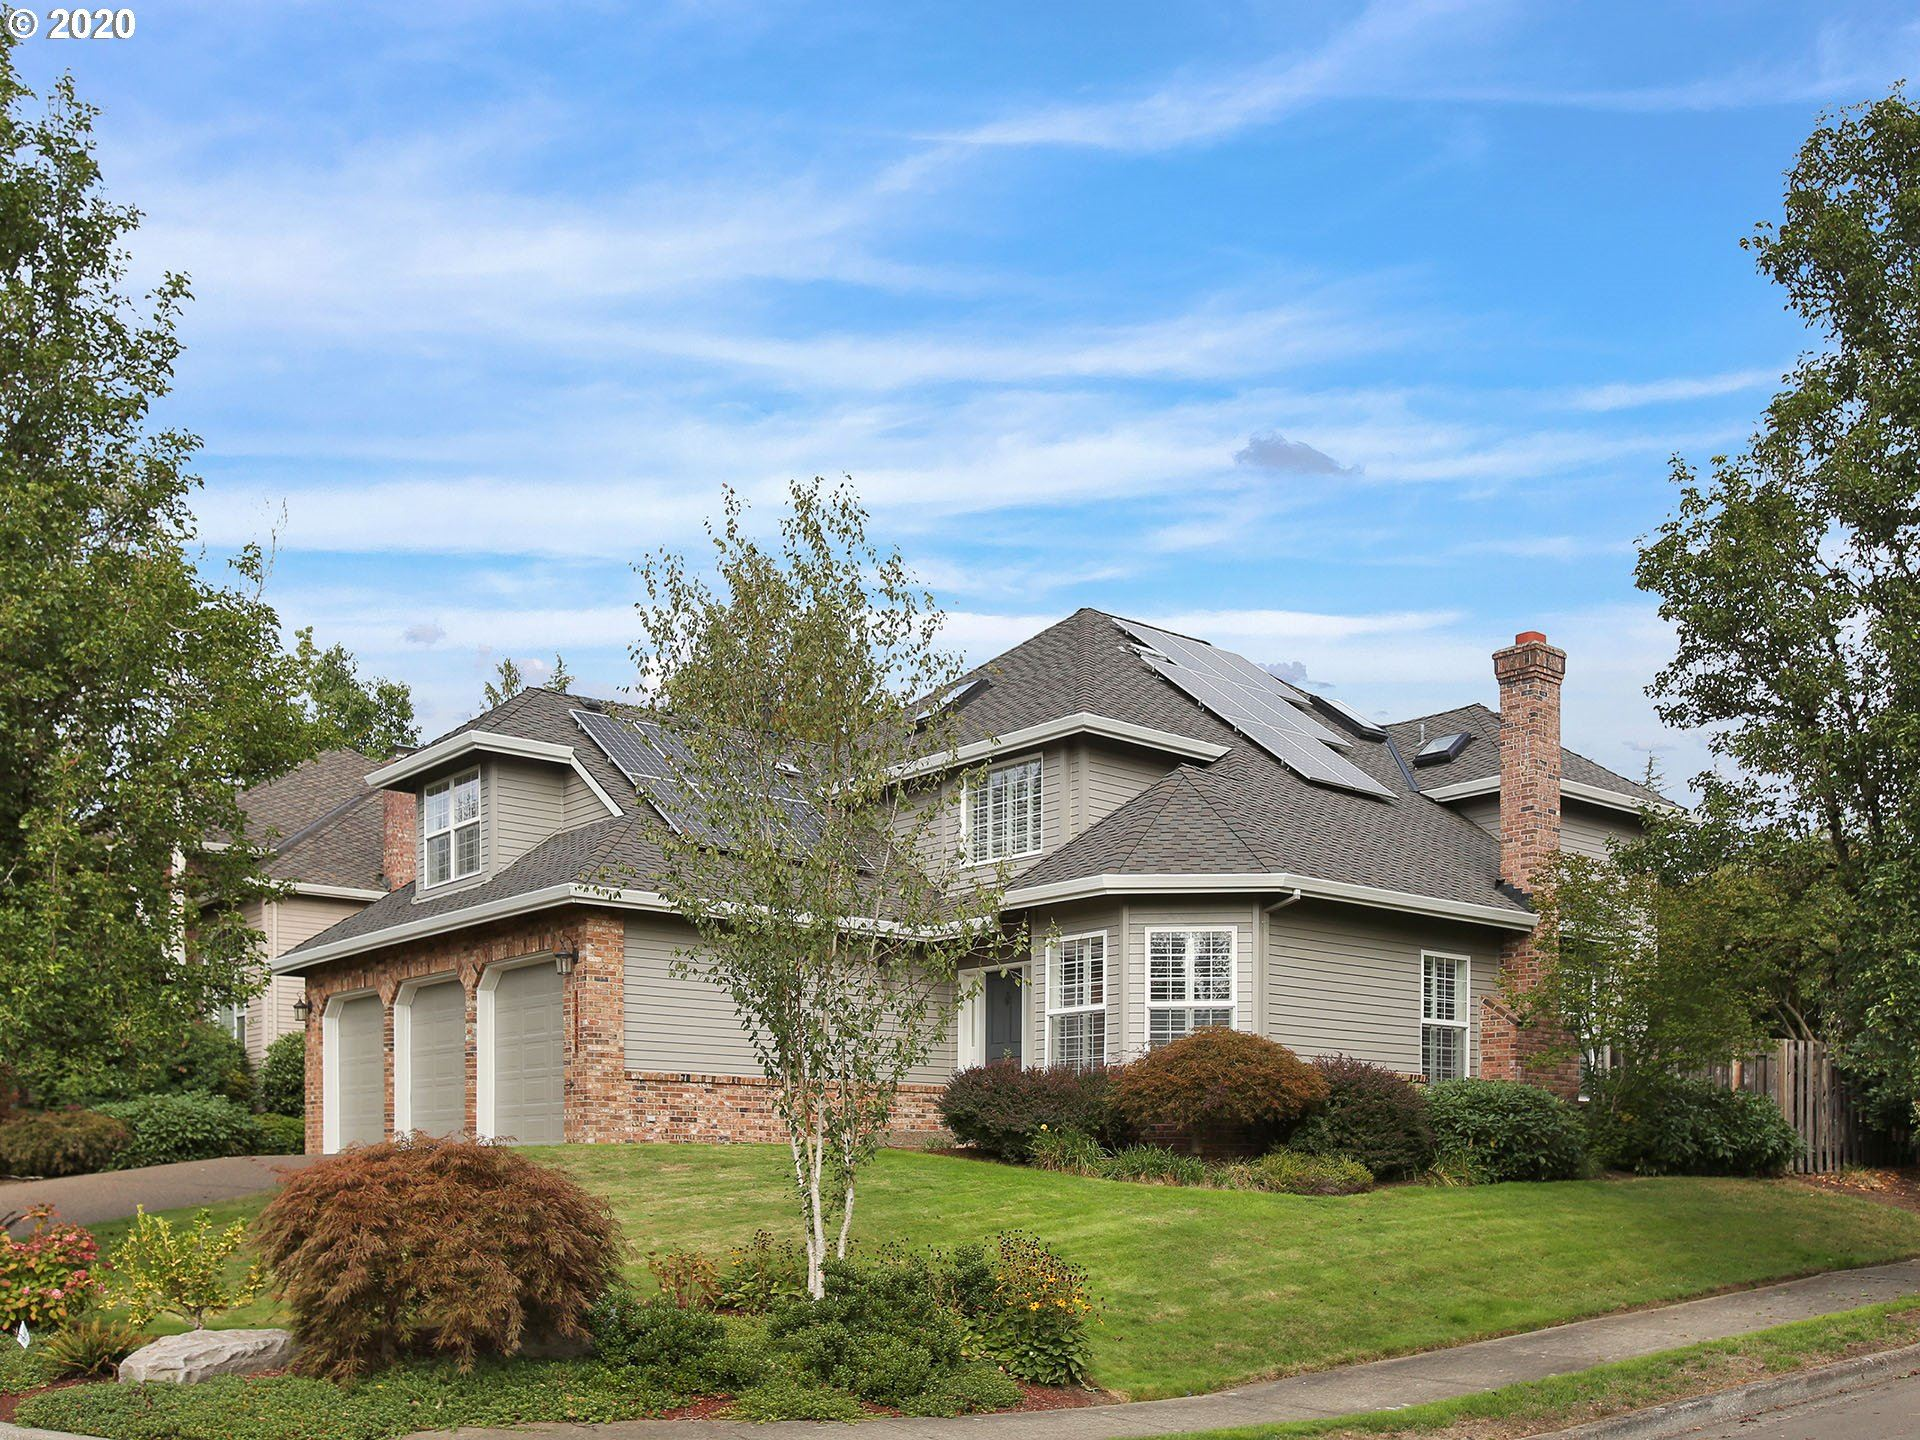 13456 PROVINCIAL HILL WAY, Lake Oswego, OR 97035 - MLS#: 20570089